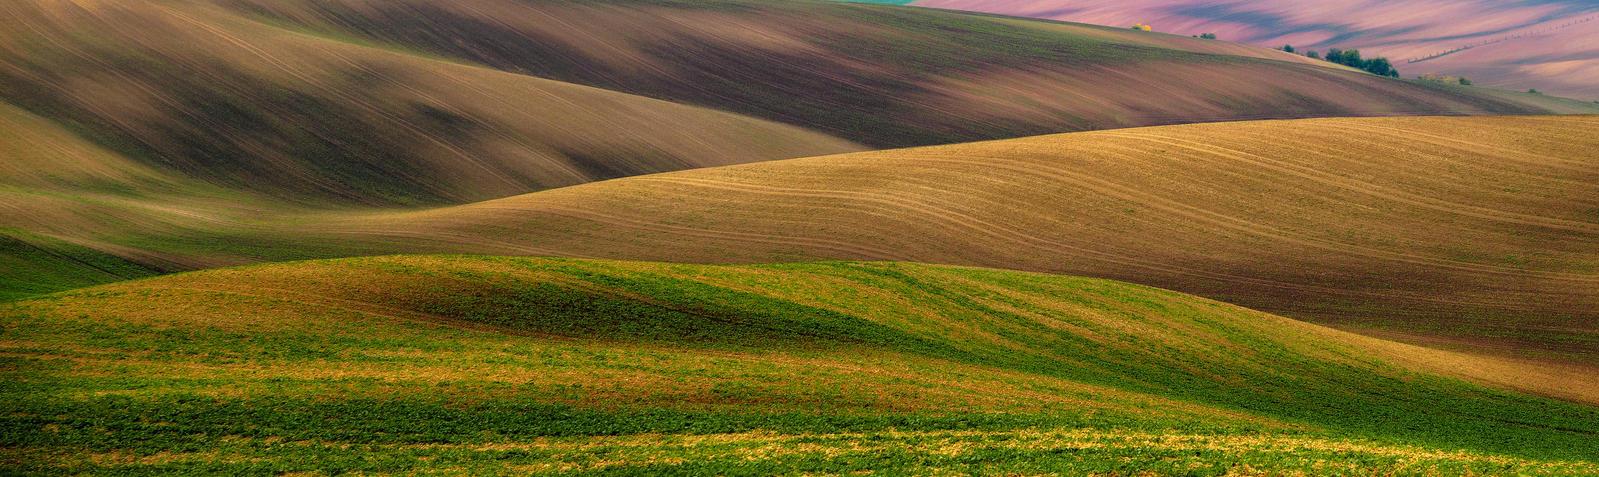 Moravia hills by AlexGutkin